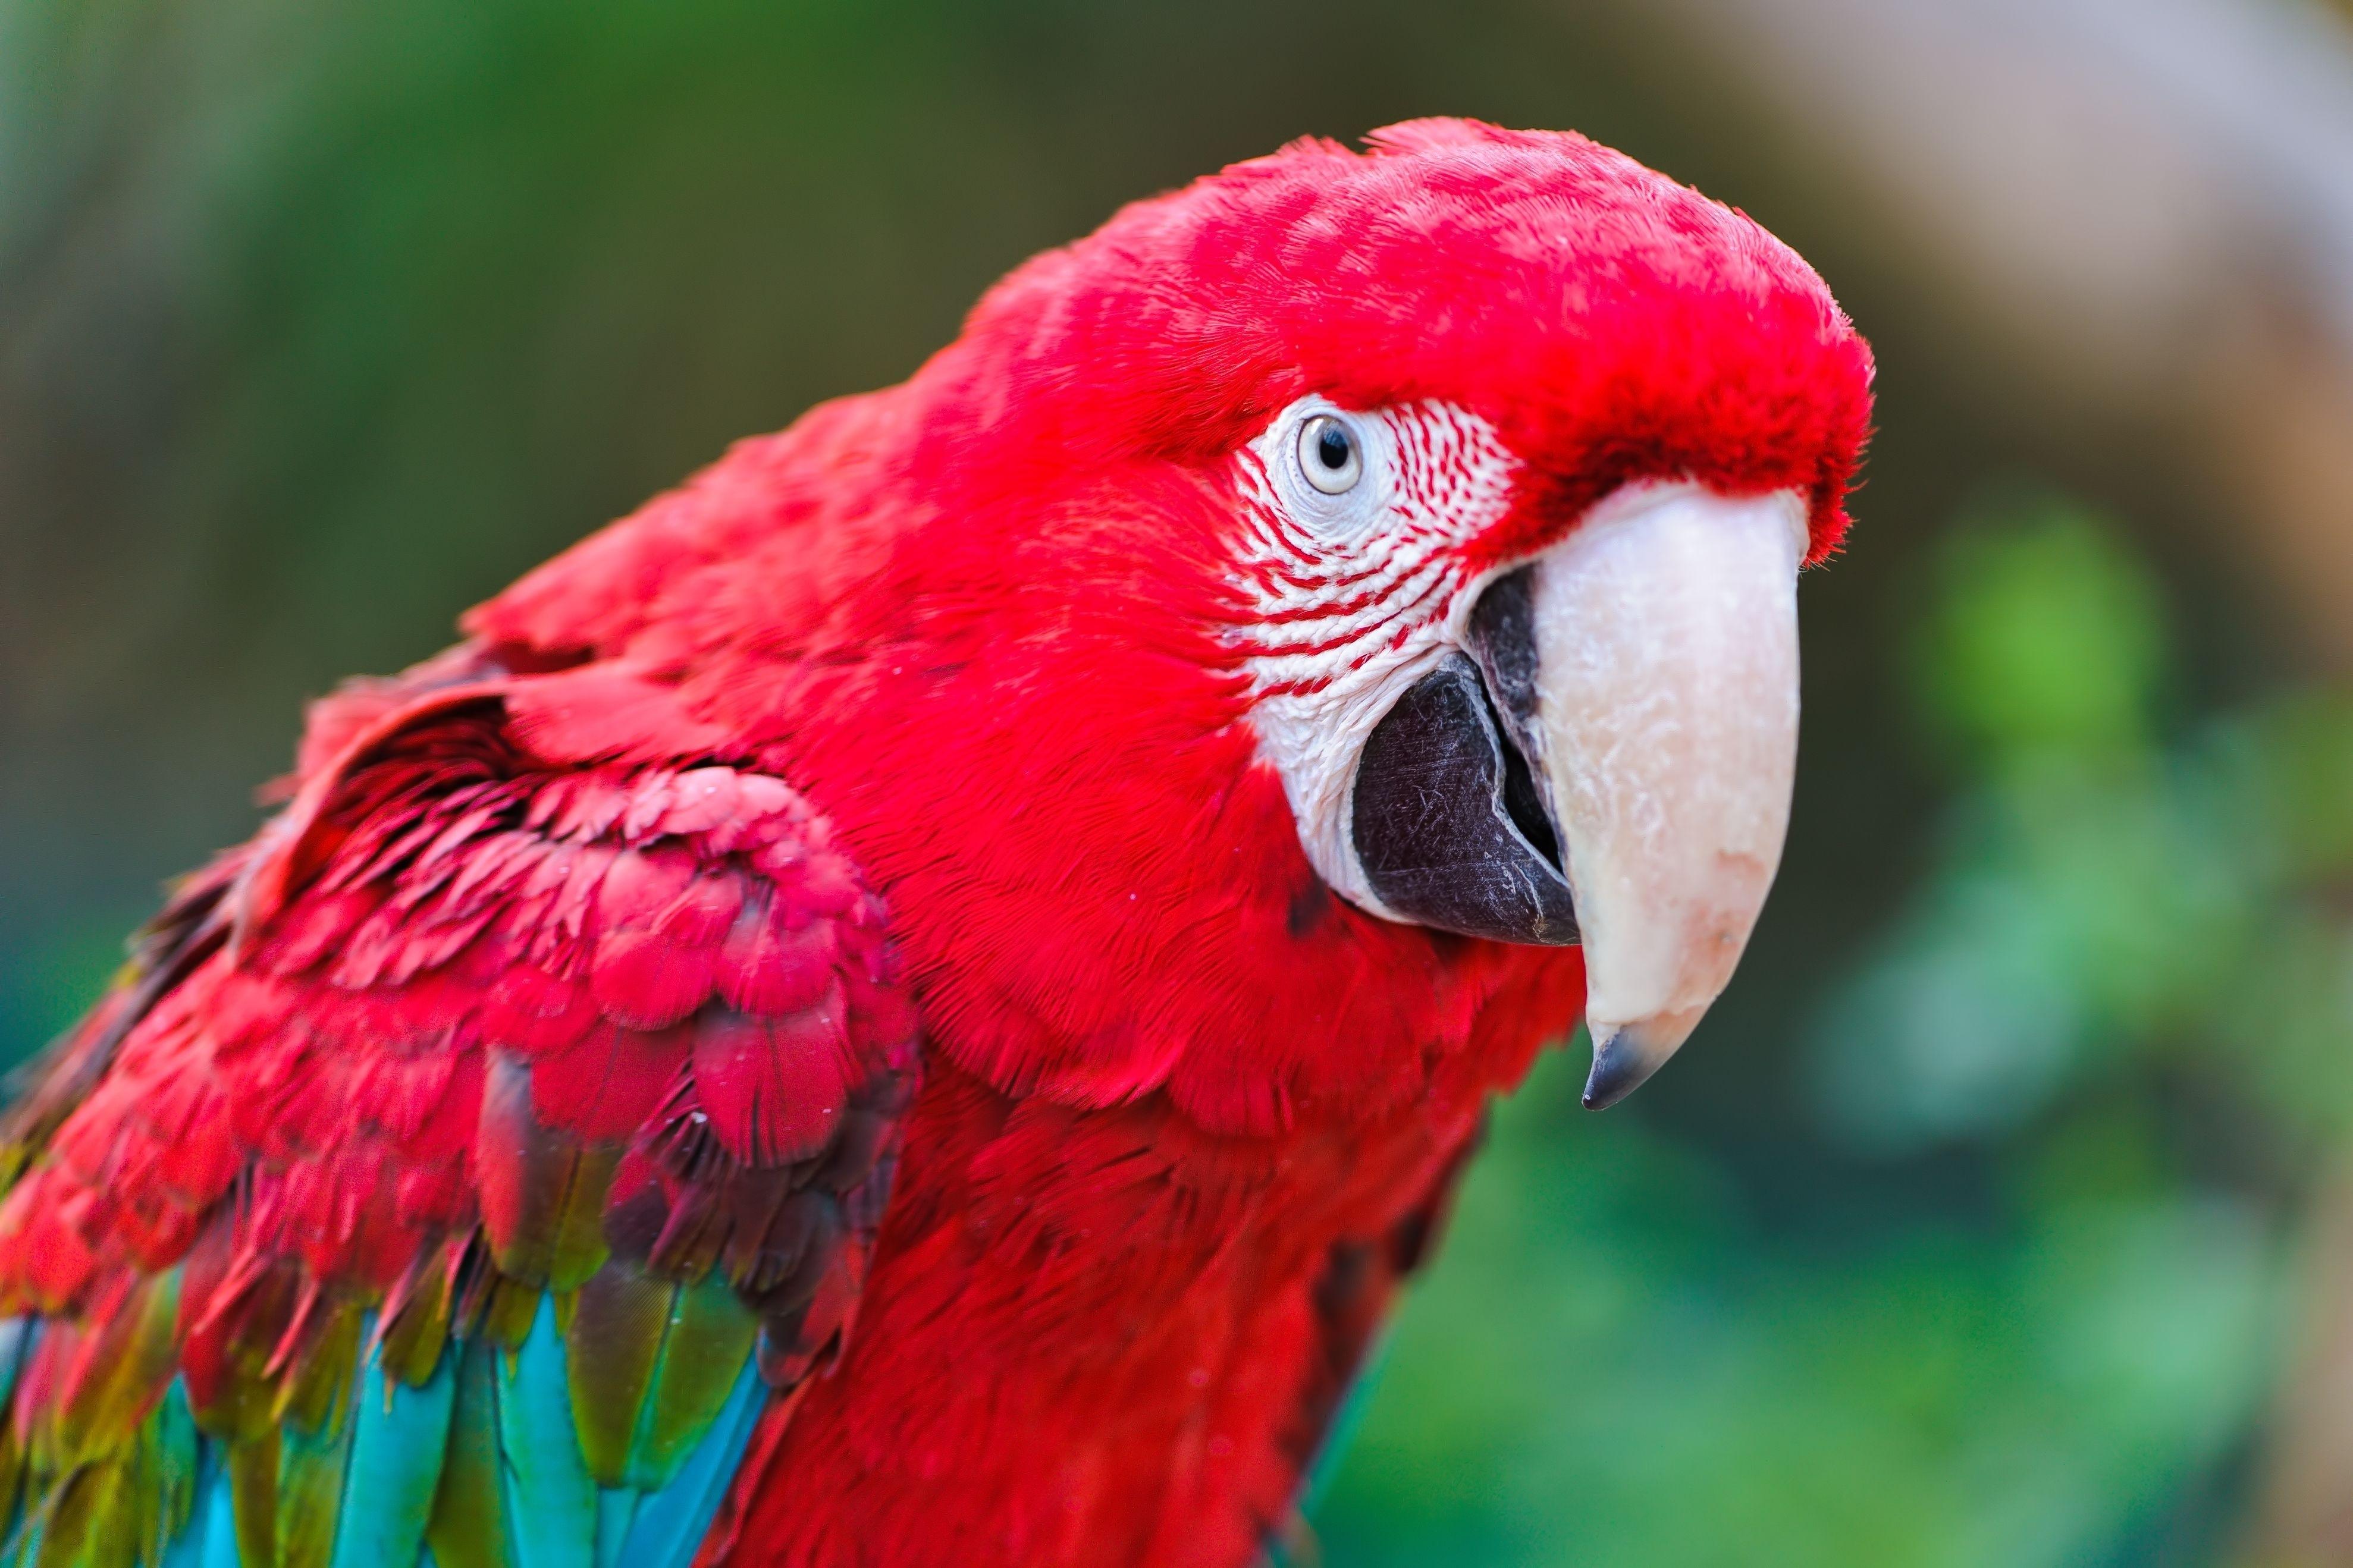 Wallpaper : parrot, beak, color, red 3956x2637 ...